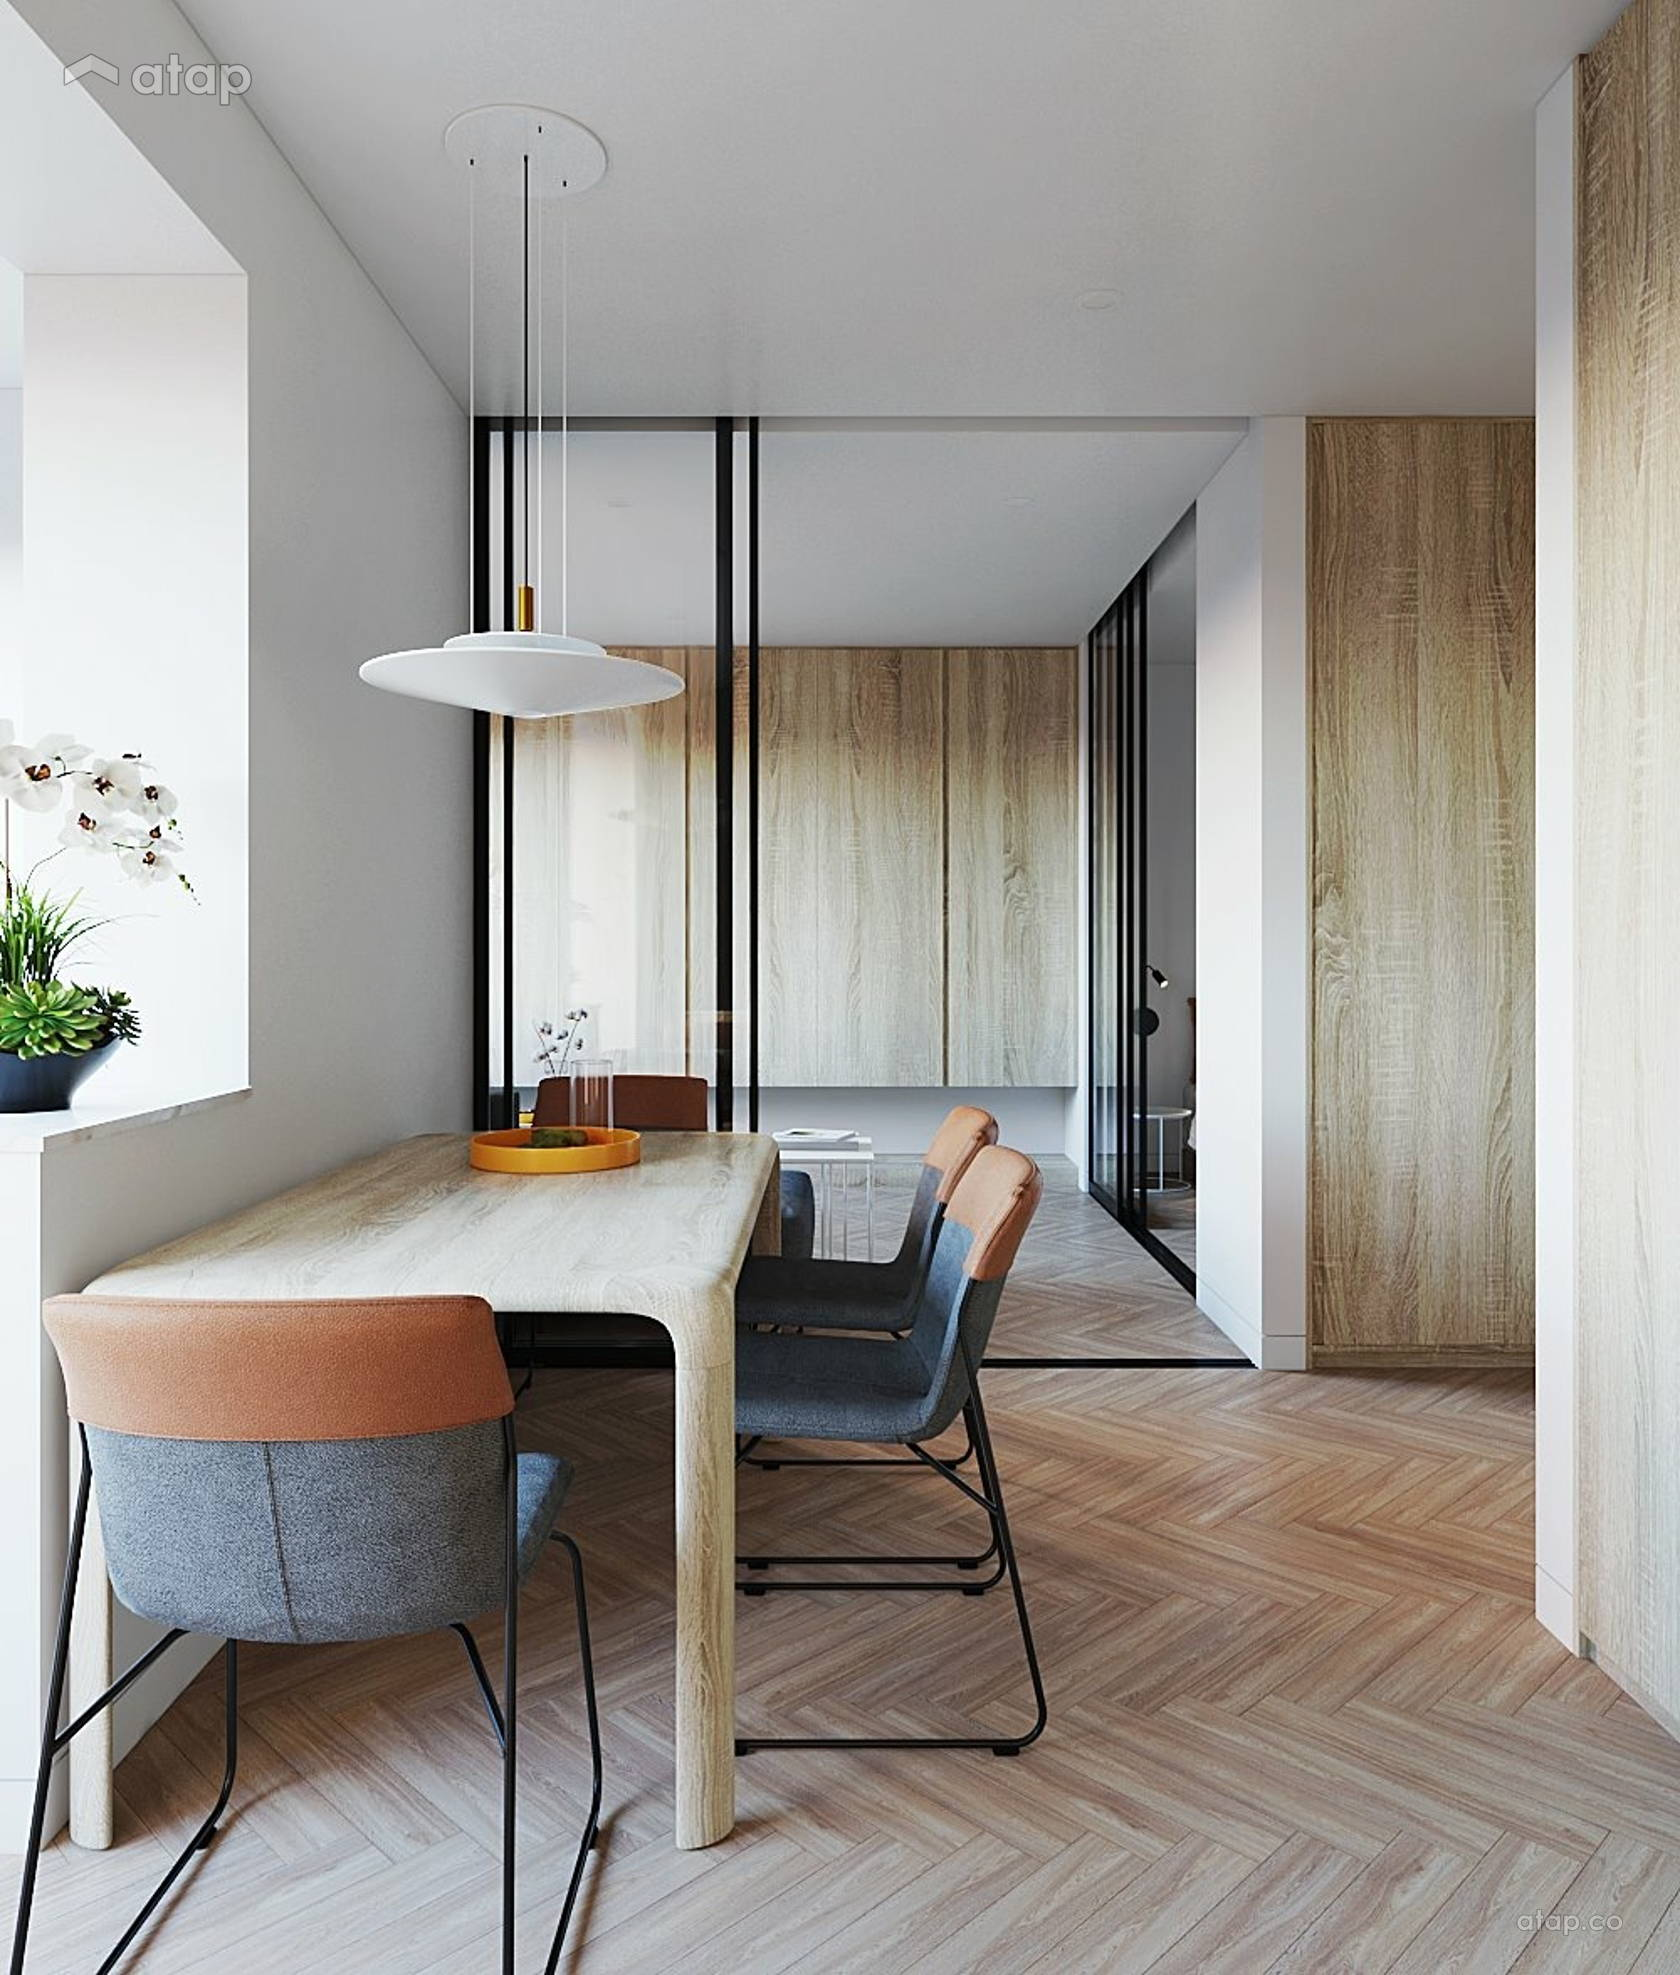 Minimalistic Zen Dining Room Living Room @ Studio, Petaling Jaya, Selangor.